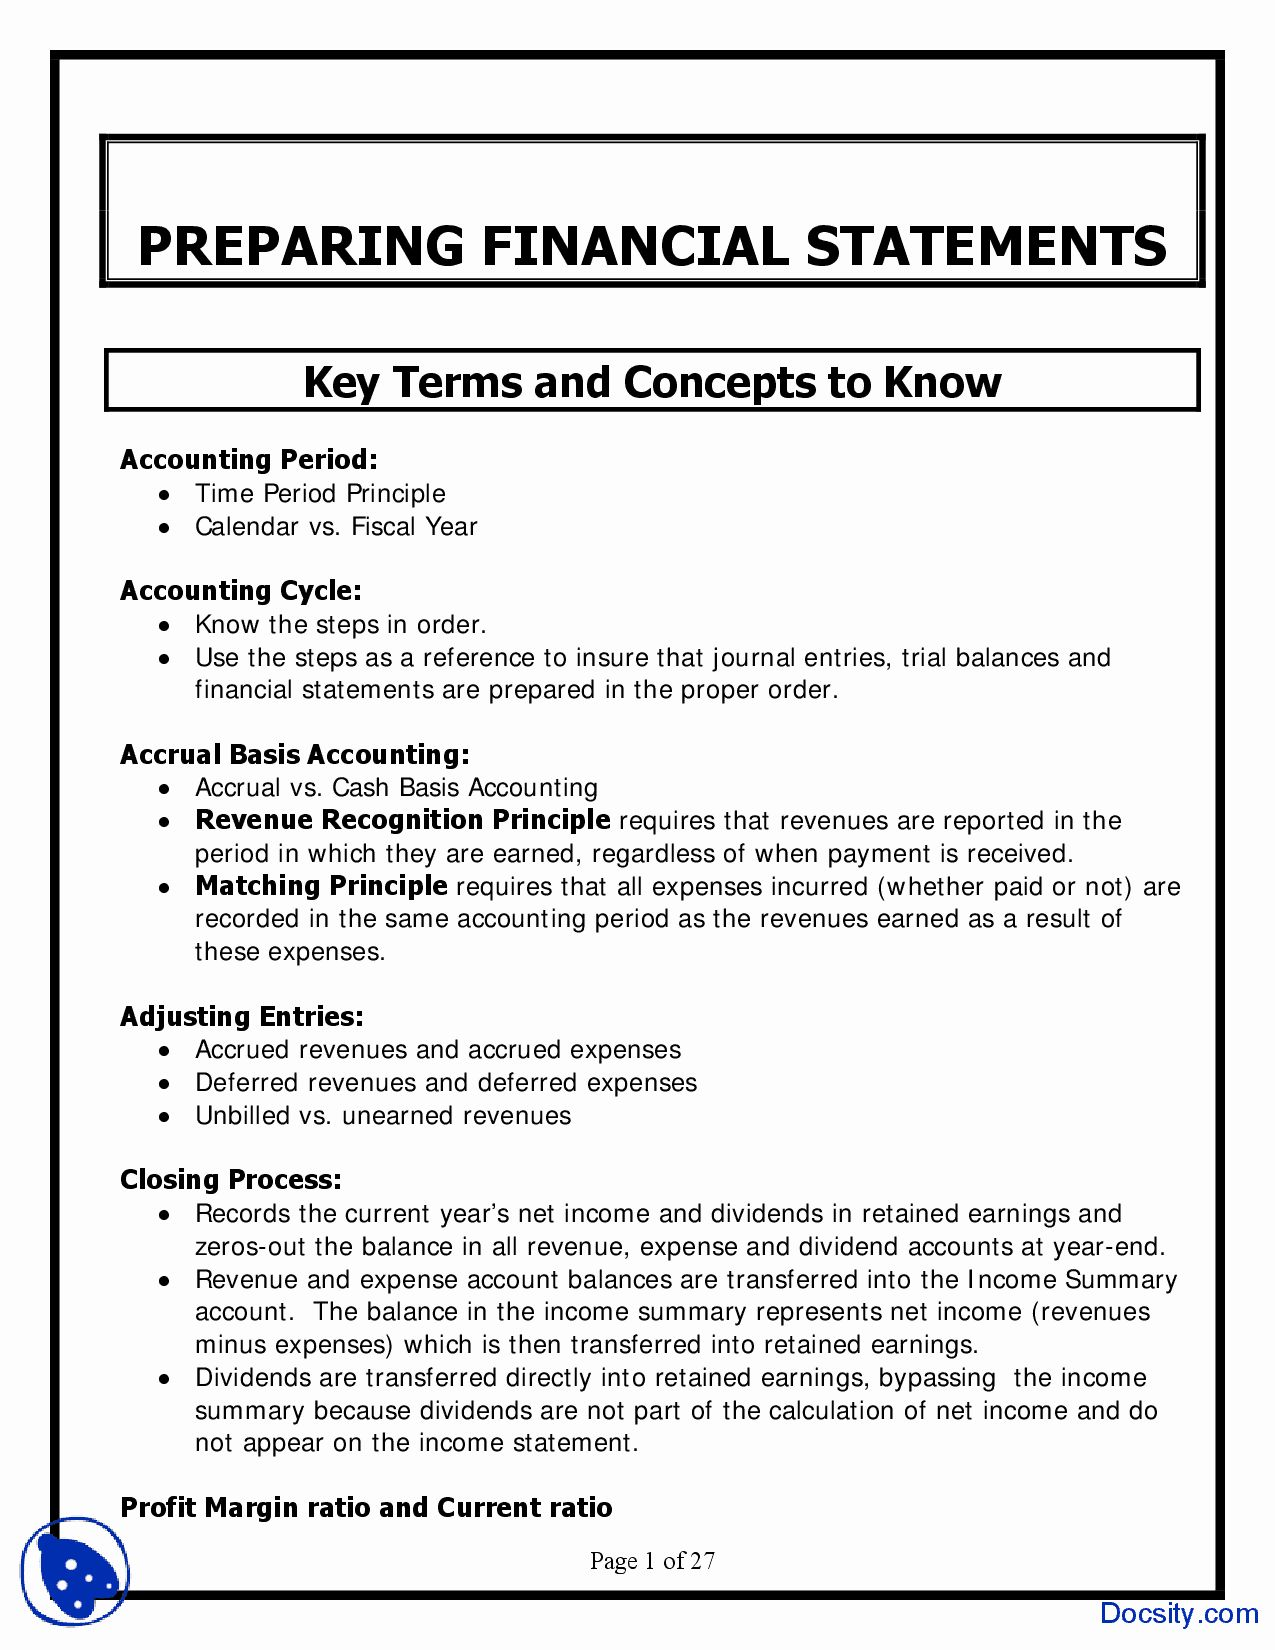 Order Of Preparing Financial Statements In